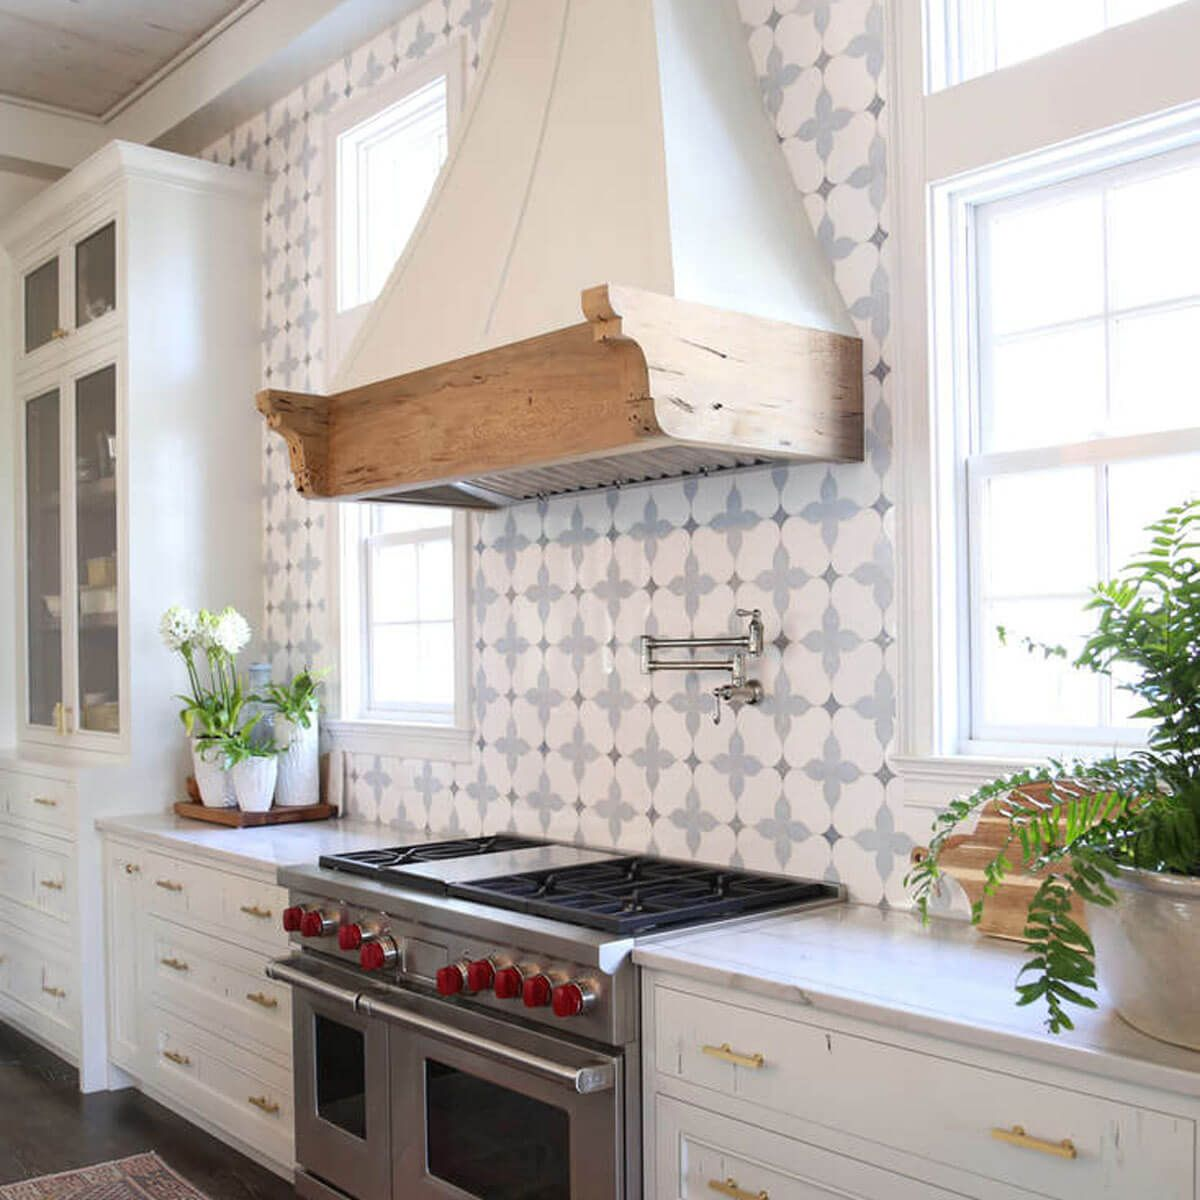 14 showstopping tile backsplash ideas to suit any style rh myhomedesign 000webhostapp com